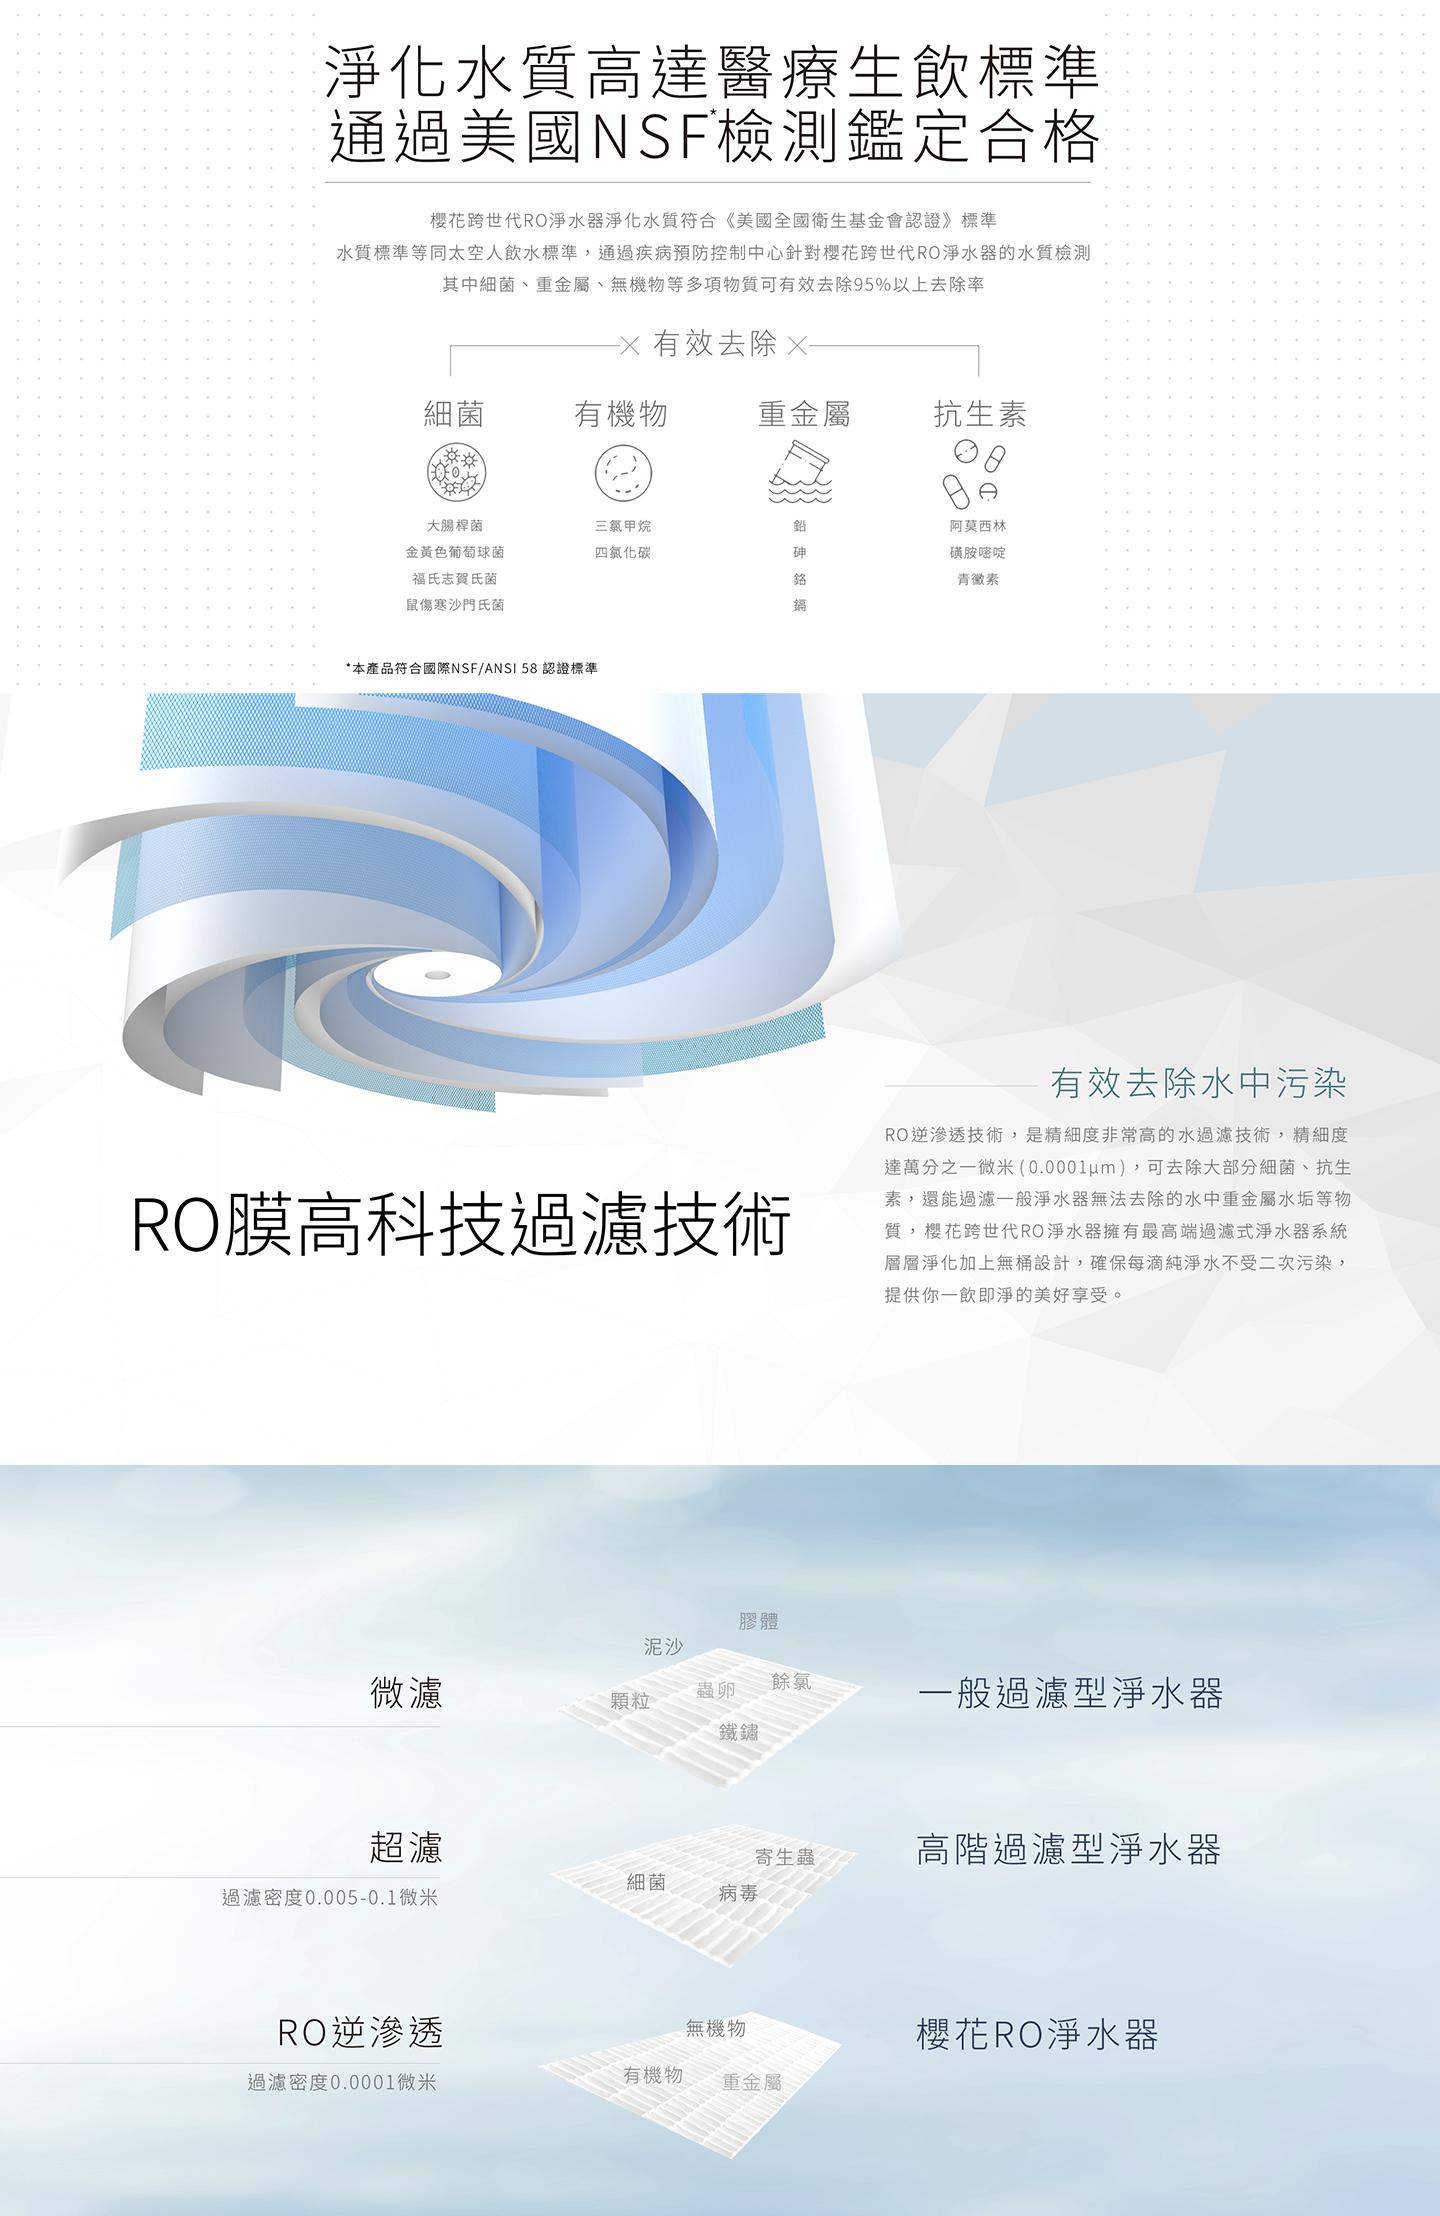 RO 產品特色頁  P0231-5.png